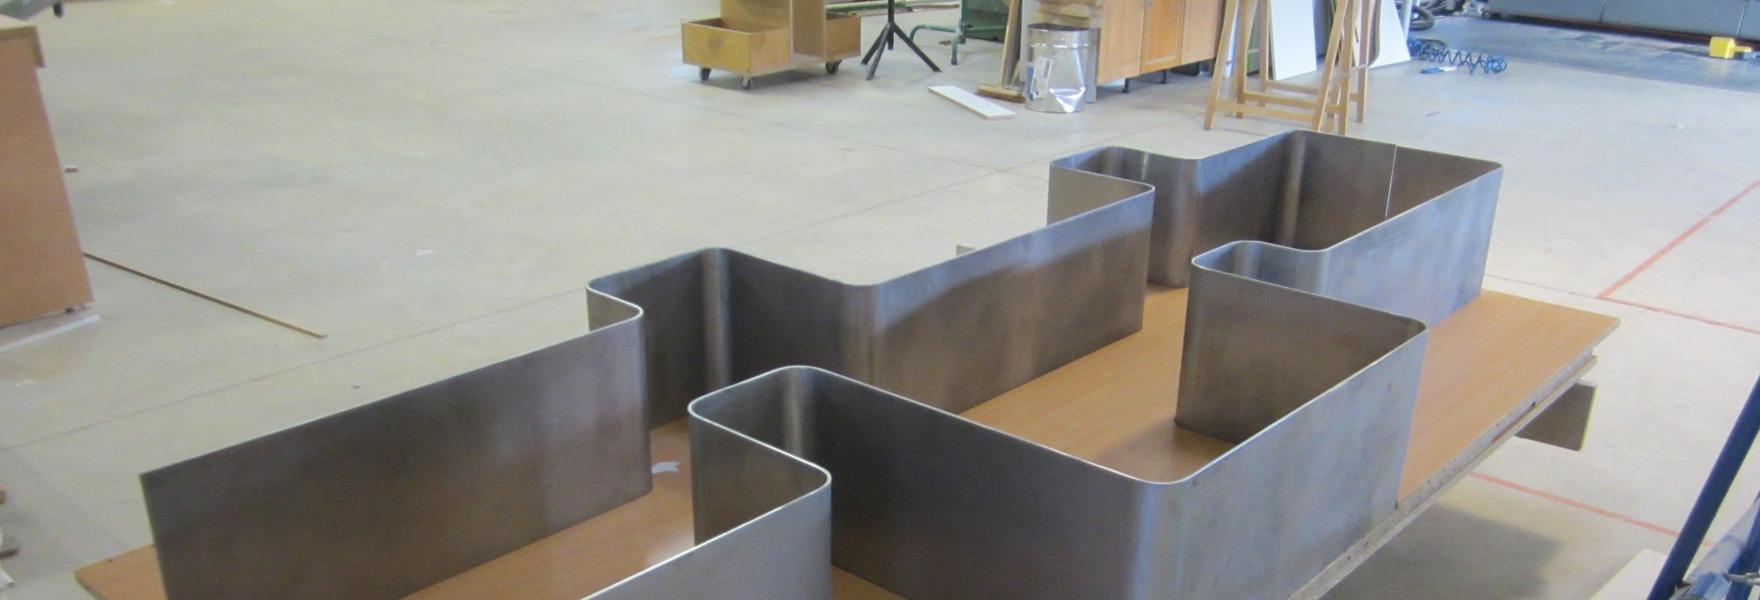 Etagères métalliques